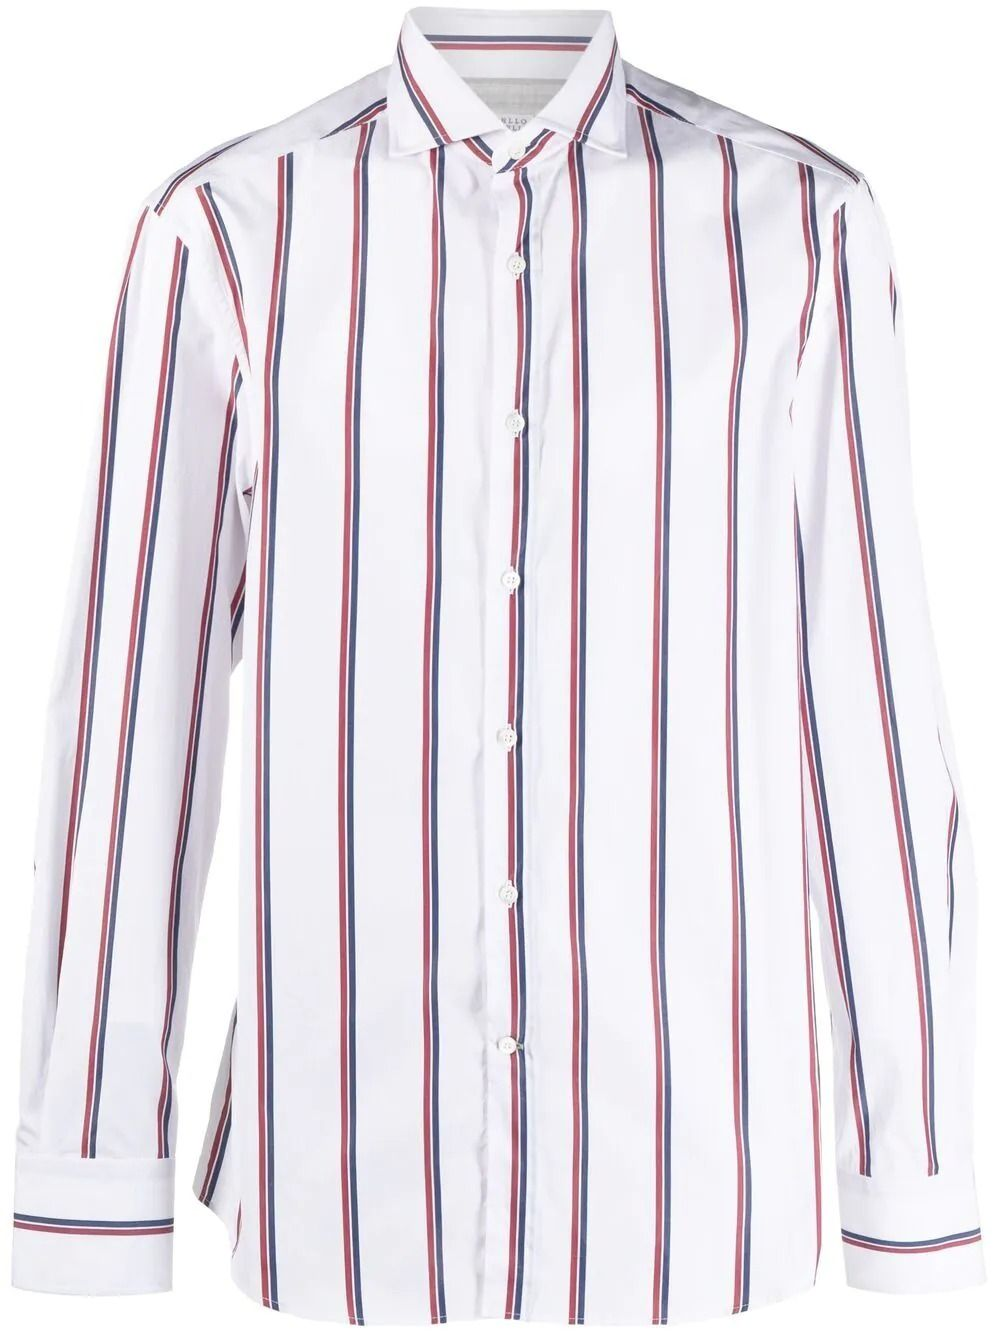 Brunello Cucinelli Shirts BRUNELLO CUCINELLI MEN'S WHITE COTTON SHIRT